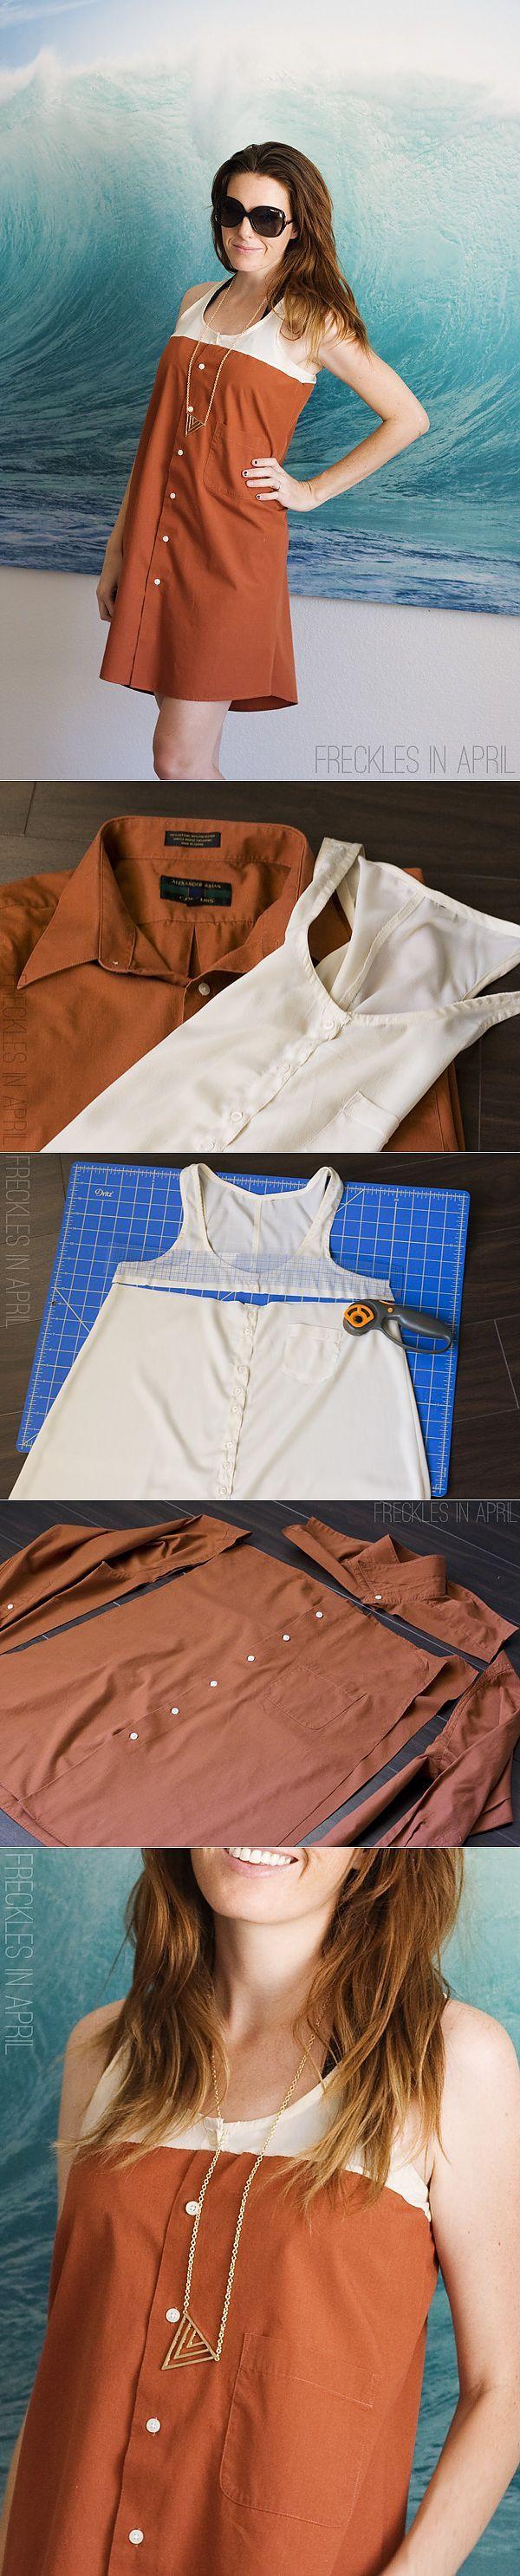 Mens shirt upcycled into a dress! Переделка рубашки в летнее платье (Diy) / Рубашки /